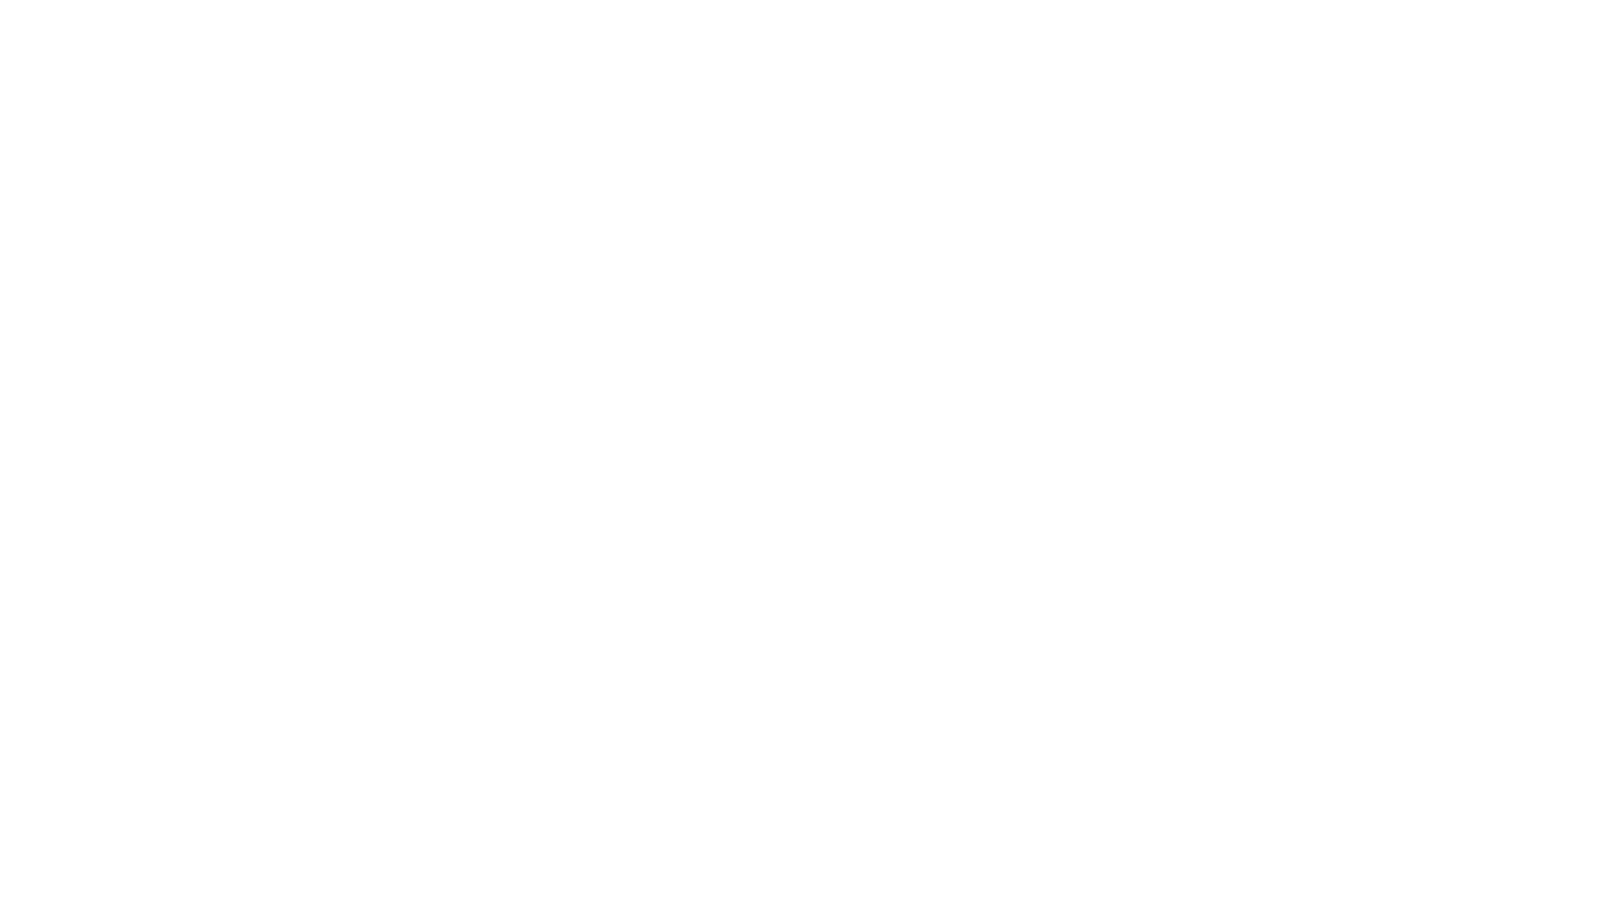 'LAAT ME EVEN'  VOCALS/LYRICS: JOOZ & KAY SLICE VIDEOCLIP BY. JOOZ BEAT BY. K.I.D BBEATS  BASSLINE BY. JOSHUA KAKISINA  MIXING ENGINEER NIKES (BEATHEAVEN.NL) MASTER ENGINEER STATINSKI   FOLLOW US AT SPOTIFY:  https://spoti.fi/2VU9p05   instagram.com/mcjooz instagram.com/kayslice instagram.com/kidbbeats  www.joozmaghetweten.nl